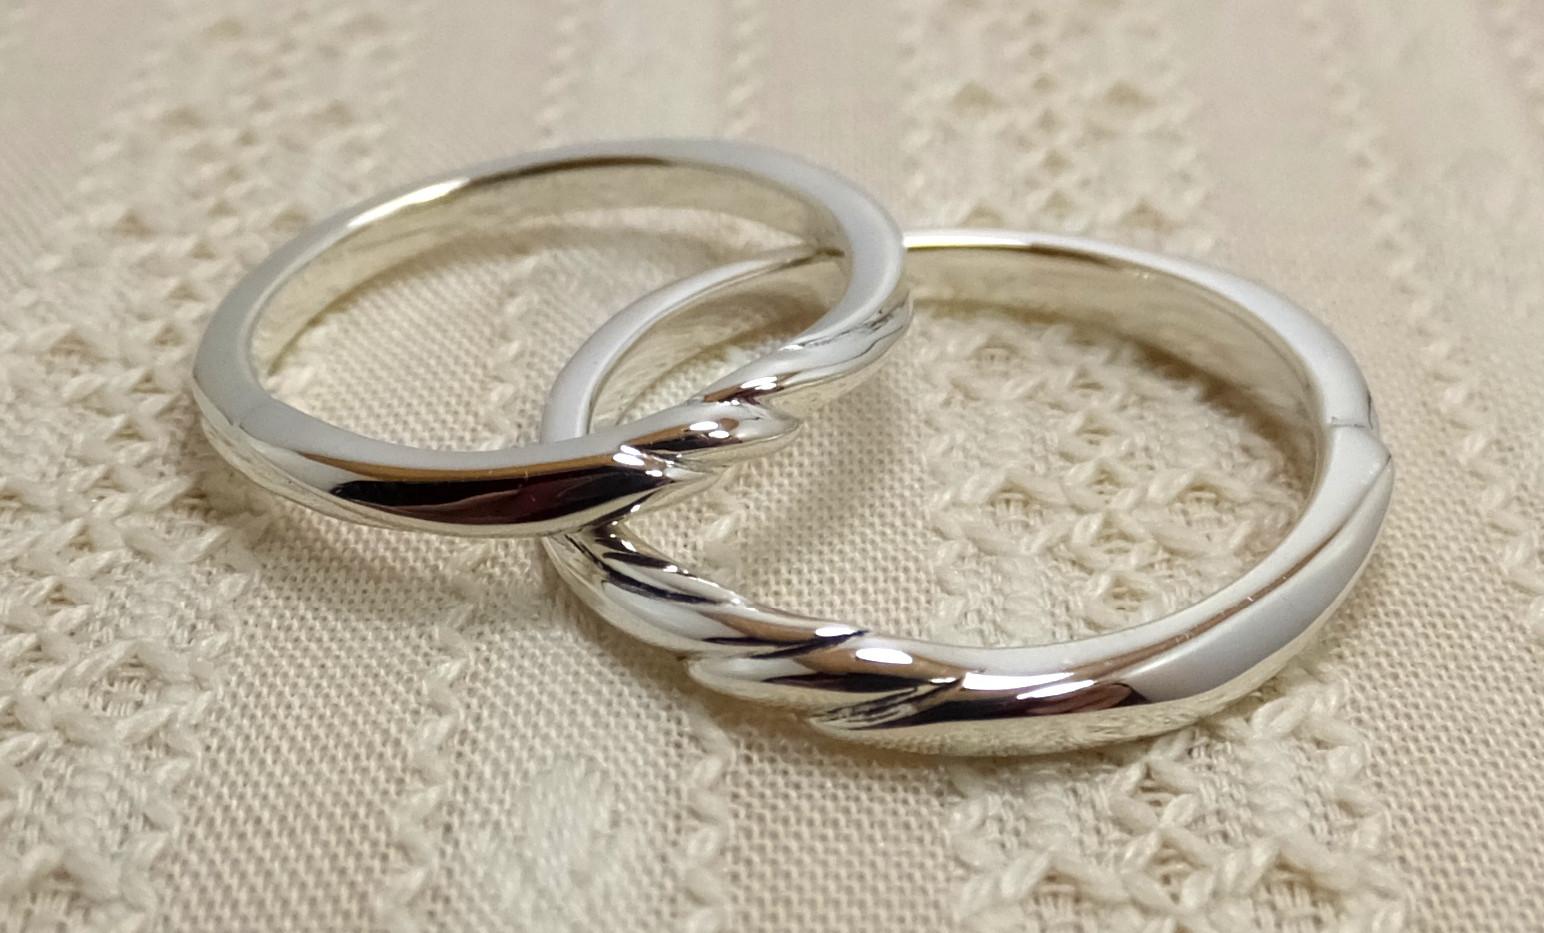 genchou design 手作り結婚指輪〈tsubame/ツバメ〉 Pt 鏡面仕上げ